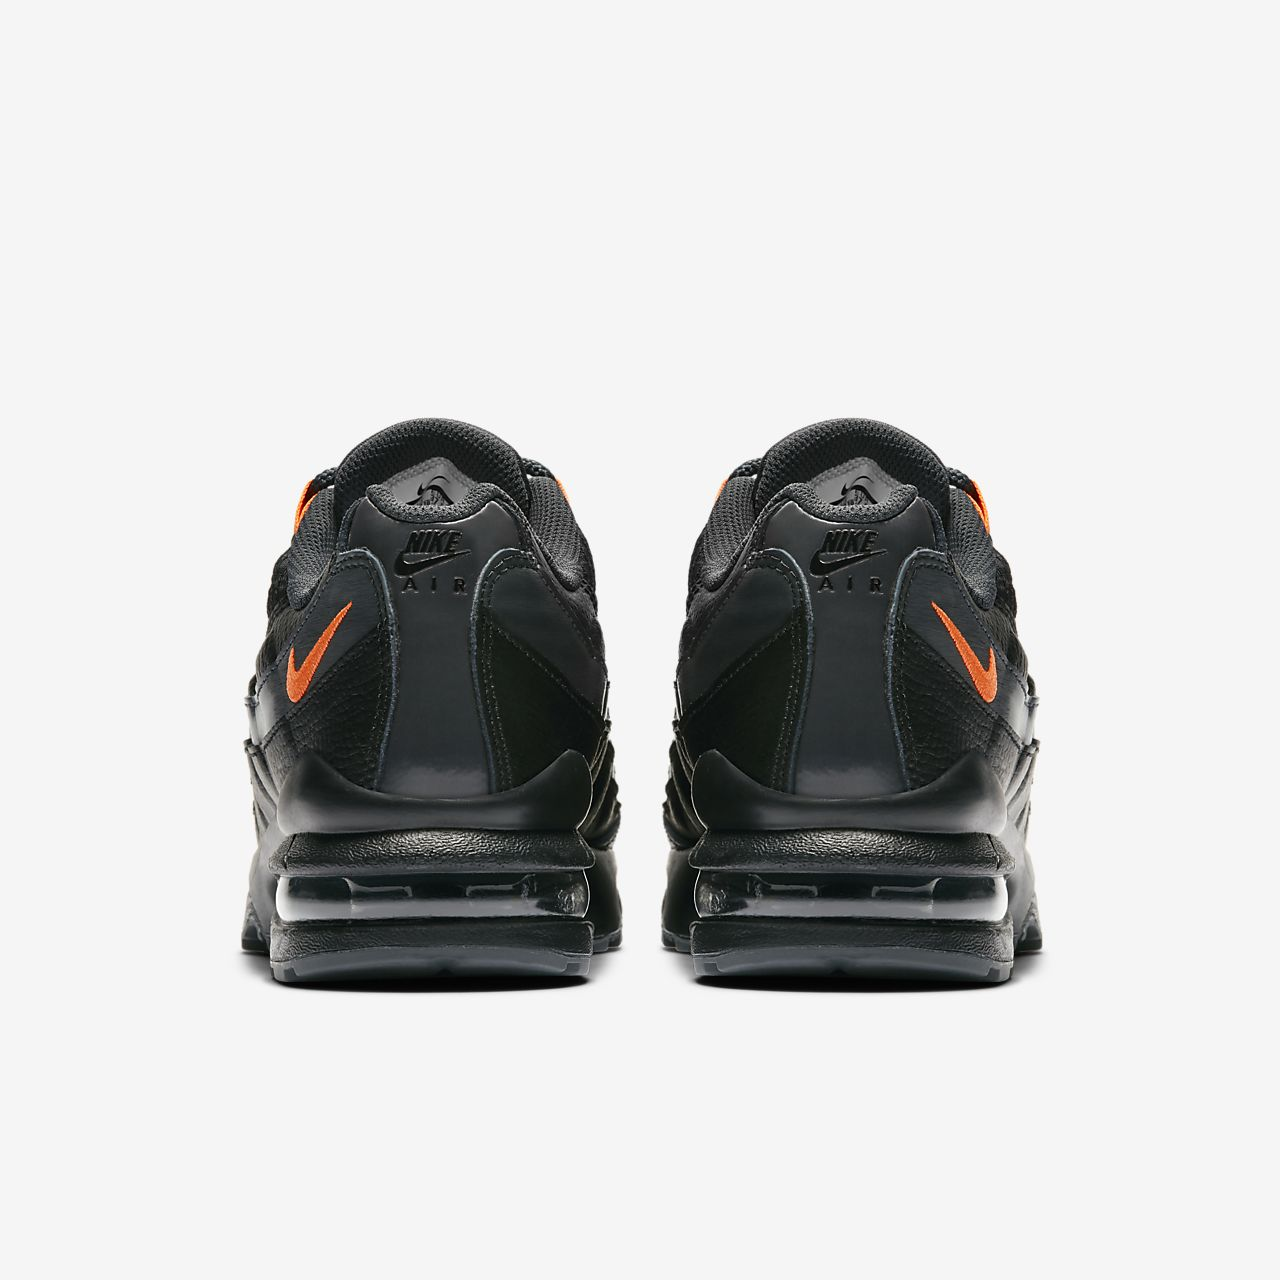 cheaper a8a96 5c8b1 ... Nike Air Max 95 SE Older Kids  Shoe